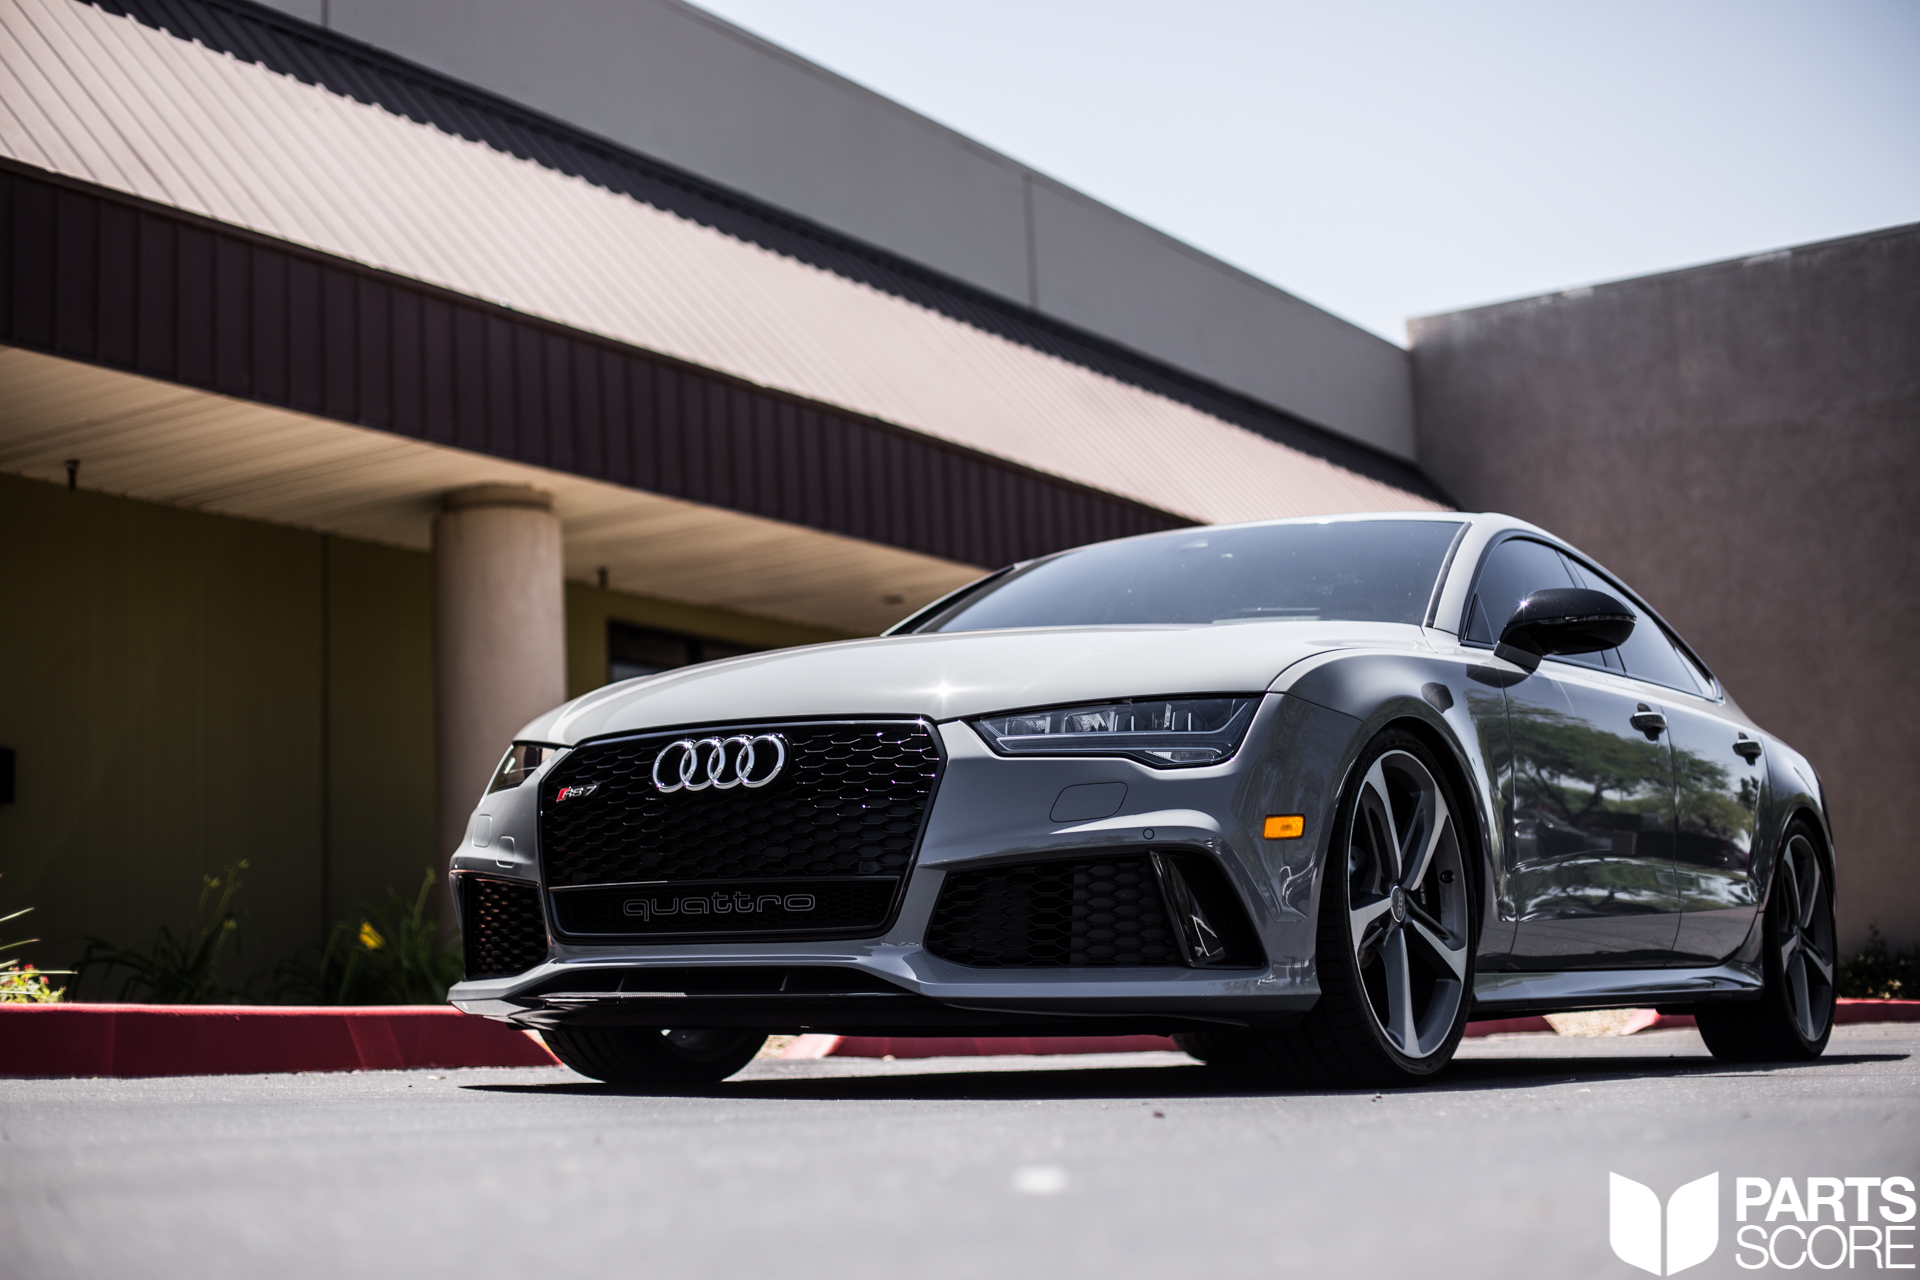 Audi, RS7, AudiRS7, Twinturbo, V8, H&R, Lowering module, Nardo grey, 2016, OEMplus